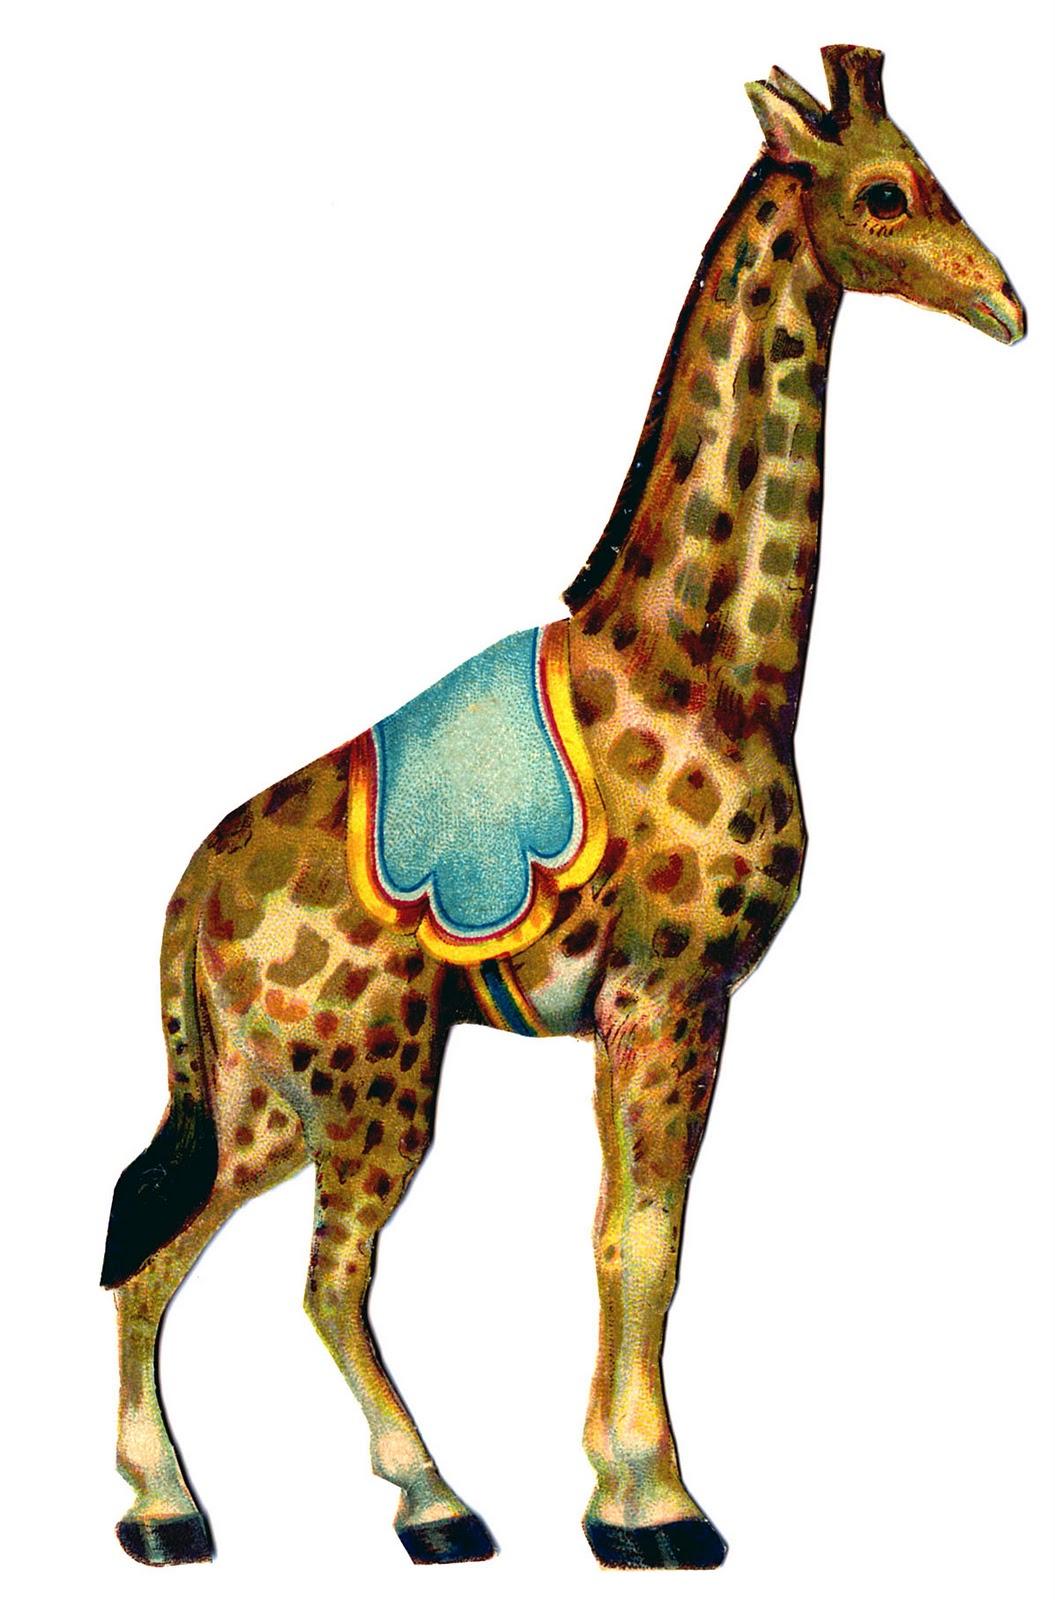 Sleleton clipart giraffe Graphics Graphic Vintage Circus Vintage